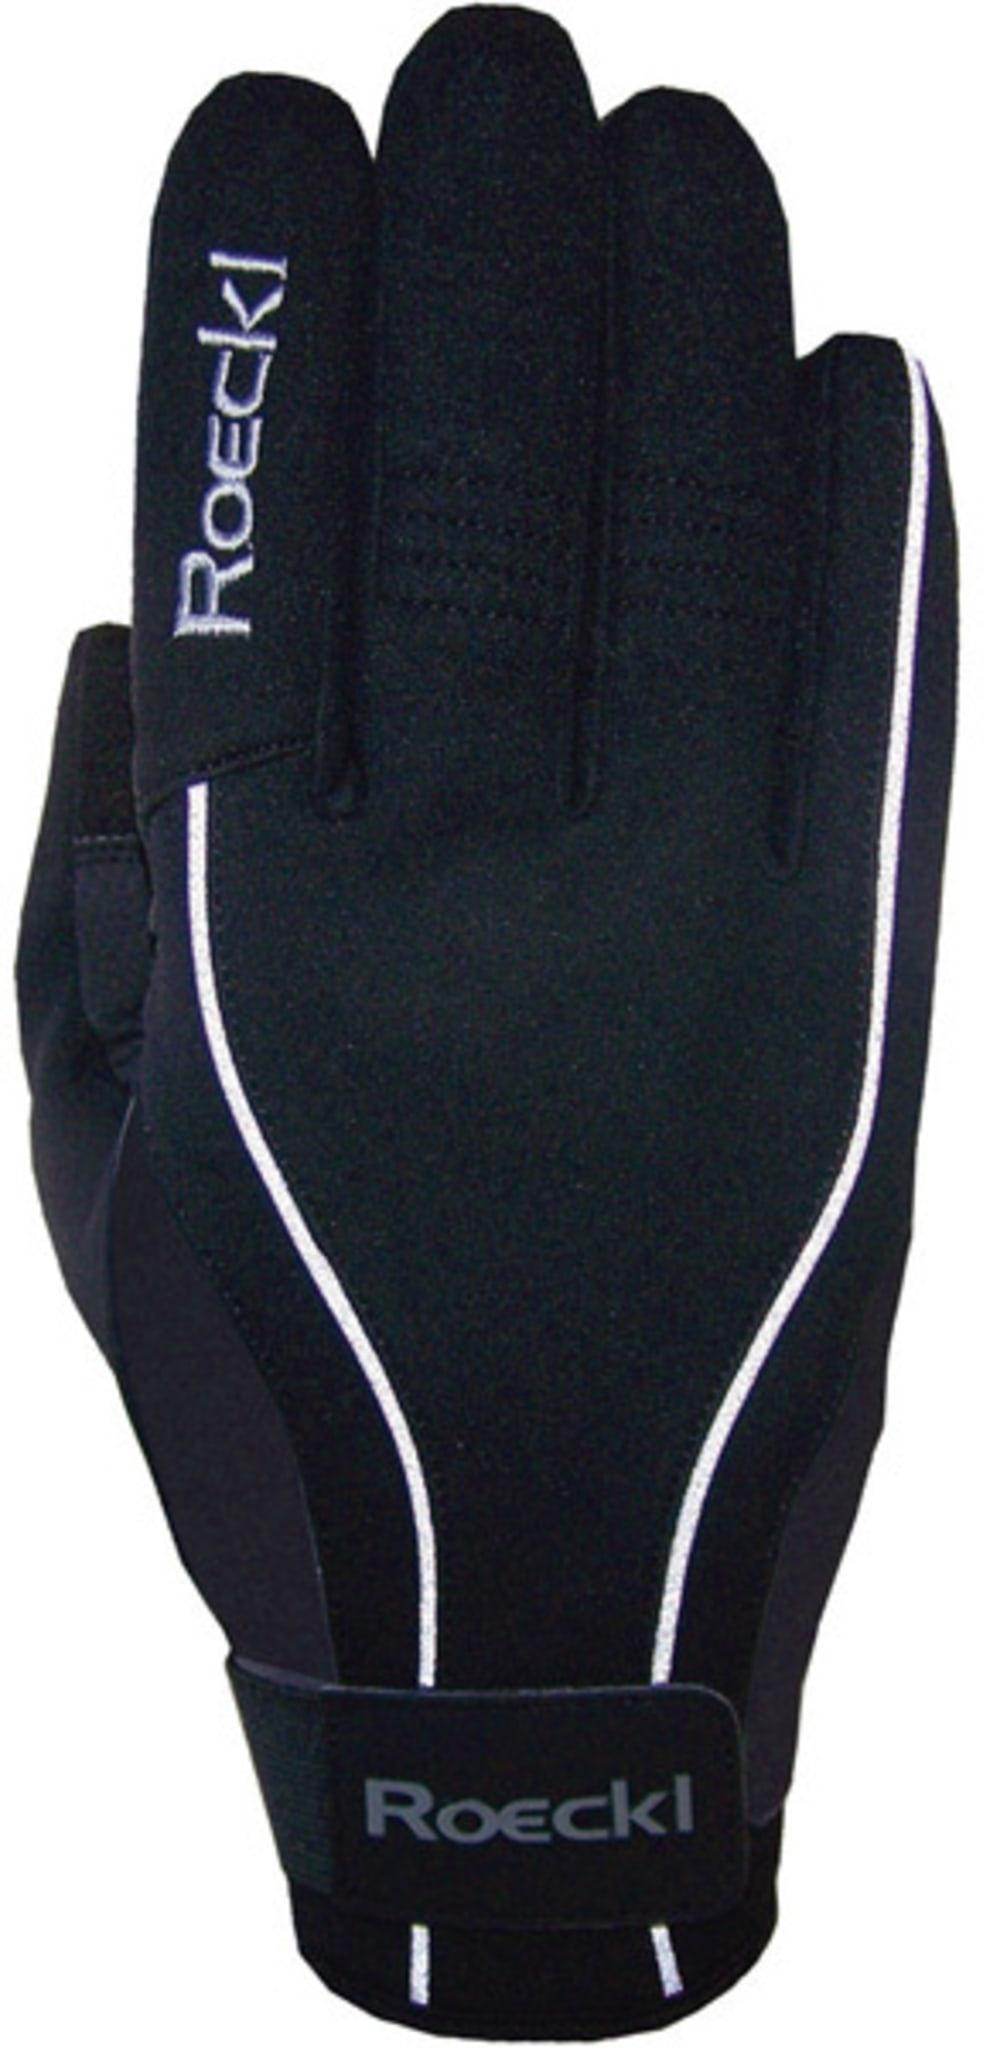 Meget komfortabel hanske fra Roeckl - en av bestselgerne.